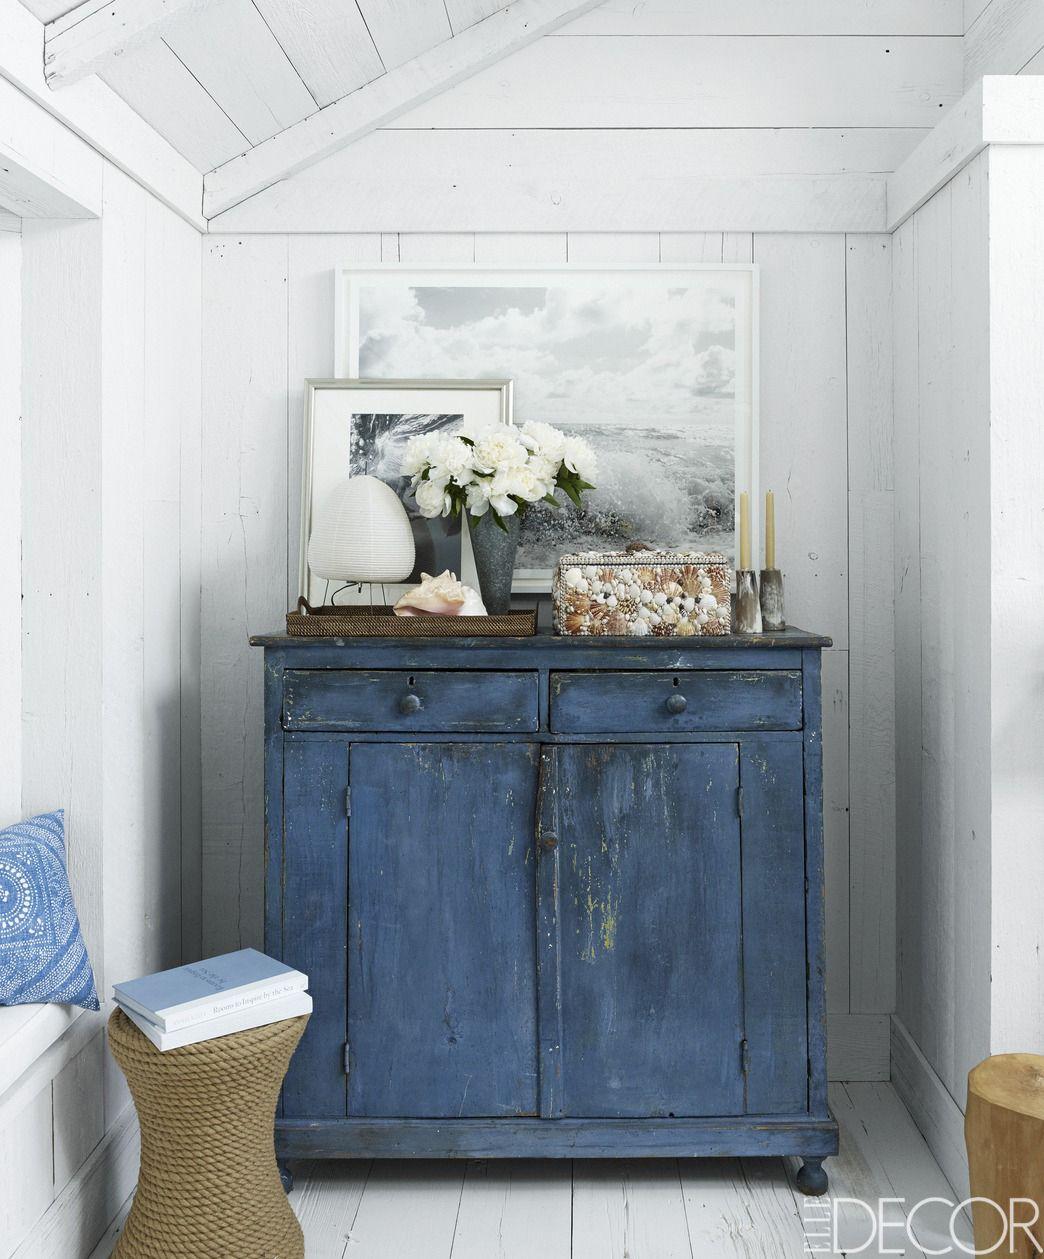 Ralph Lauren Hamptons Room: 14 Ways To Decorate An Awkward Corner